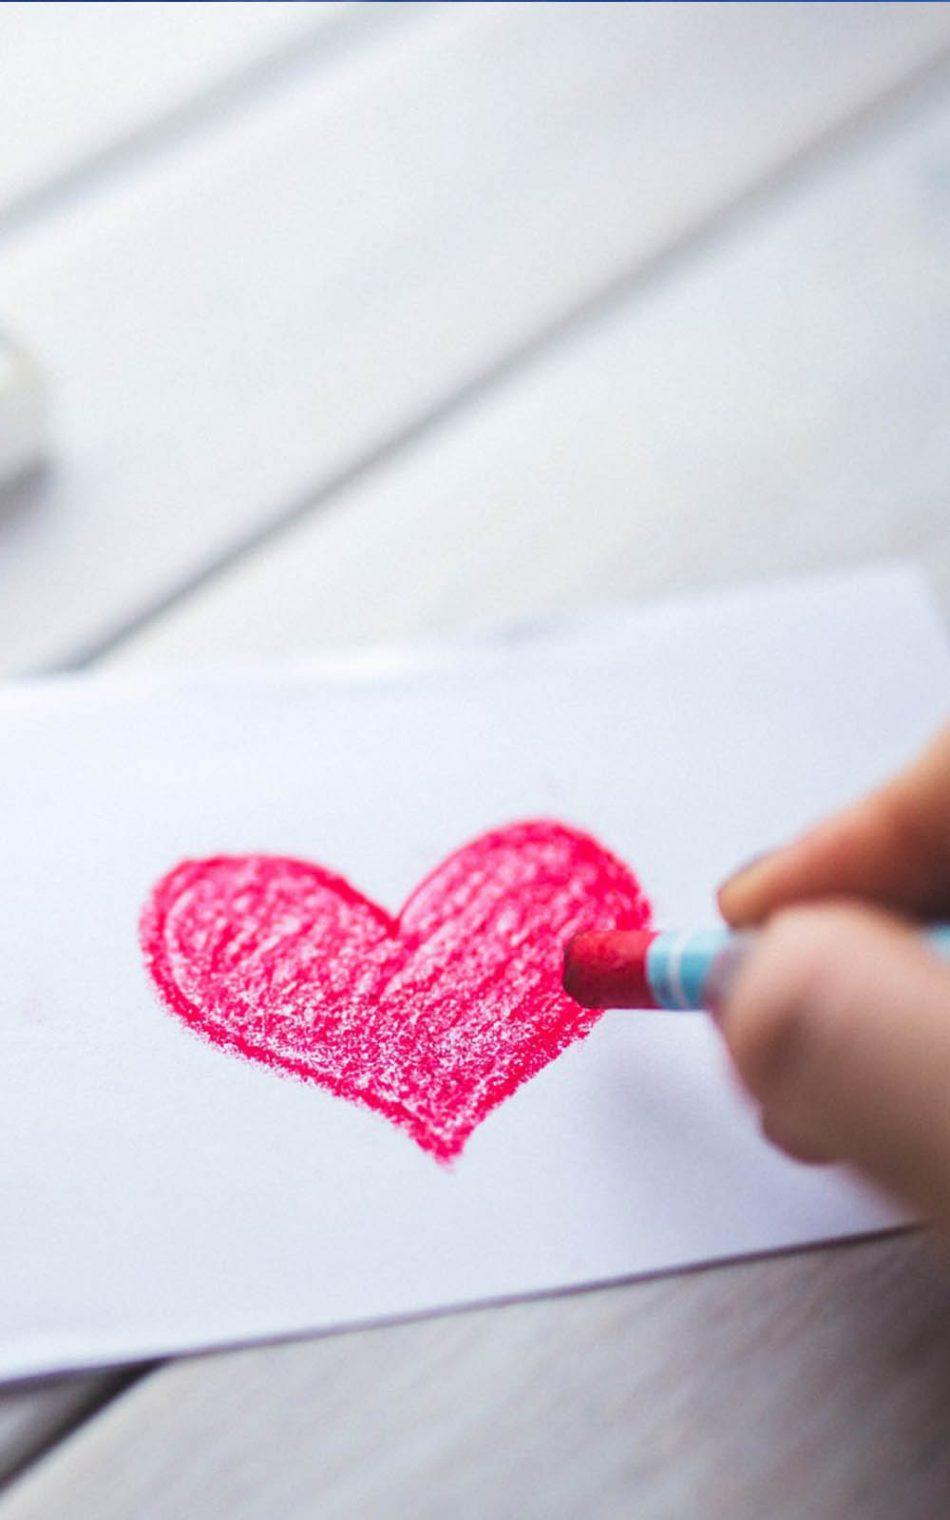 Heart color sketch hd mobile wallpaper